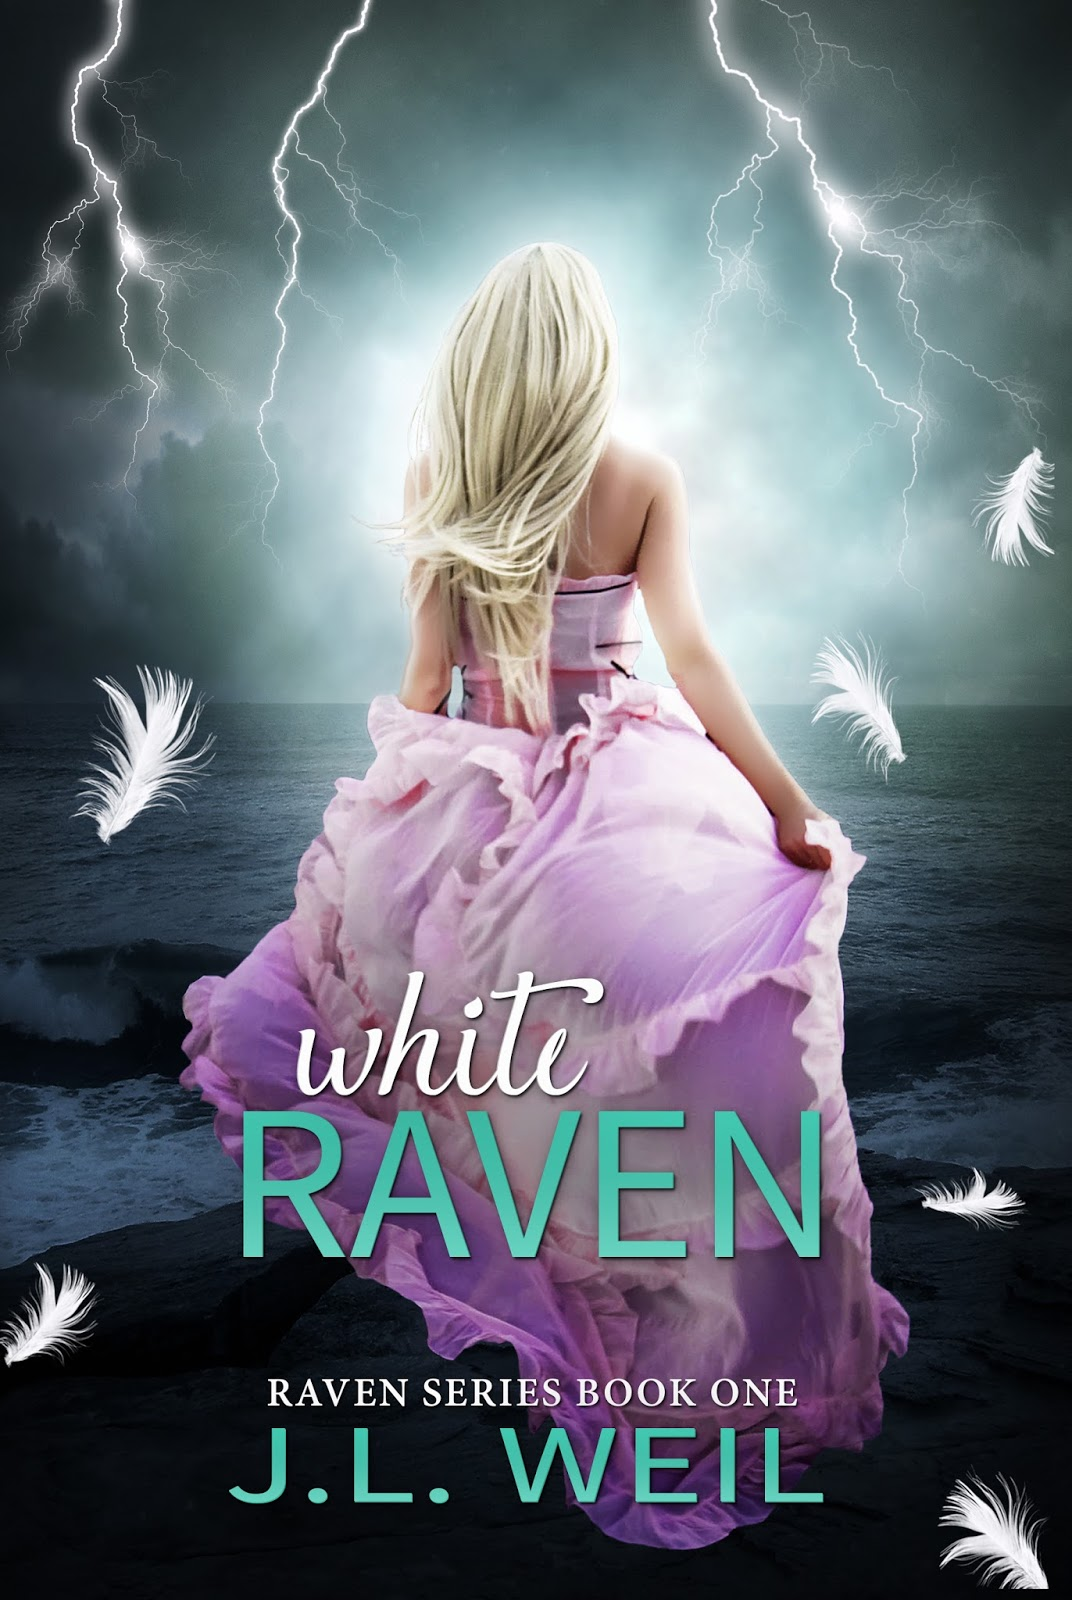 Book 1: White Raven